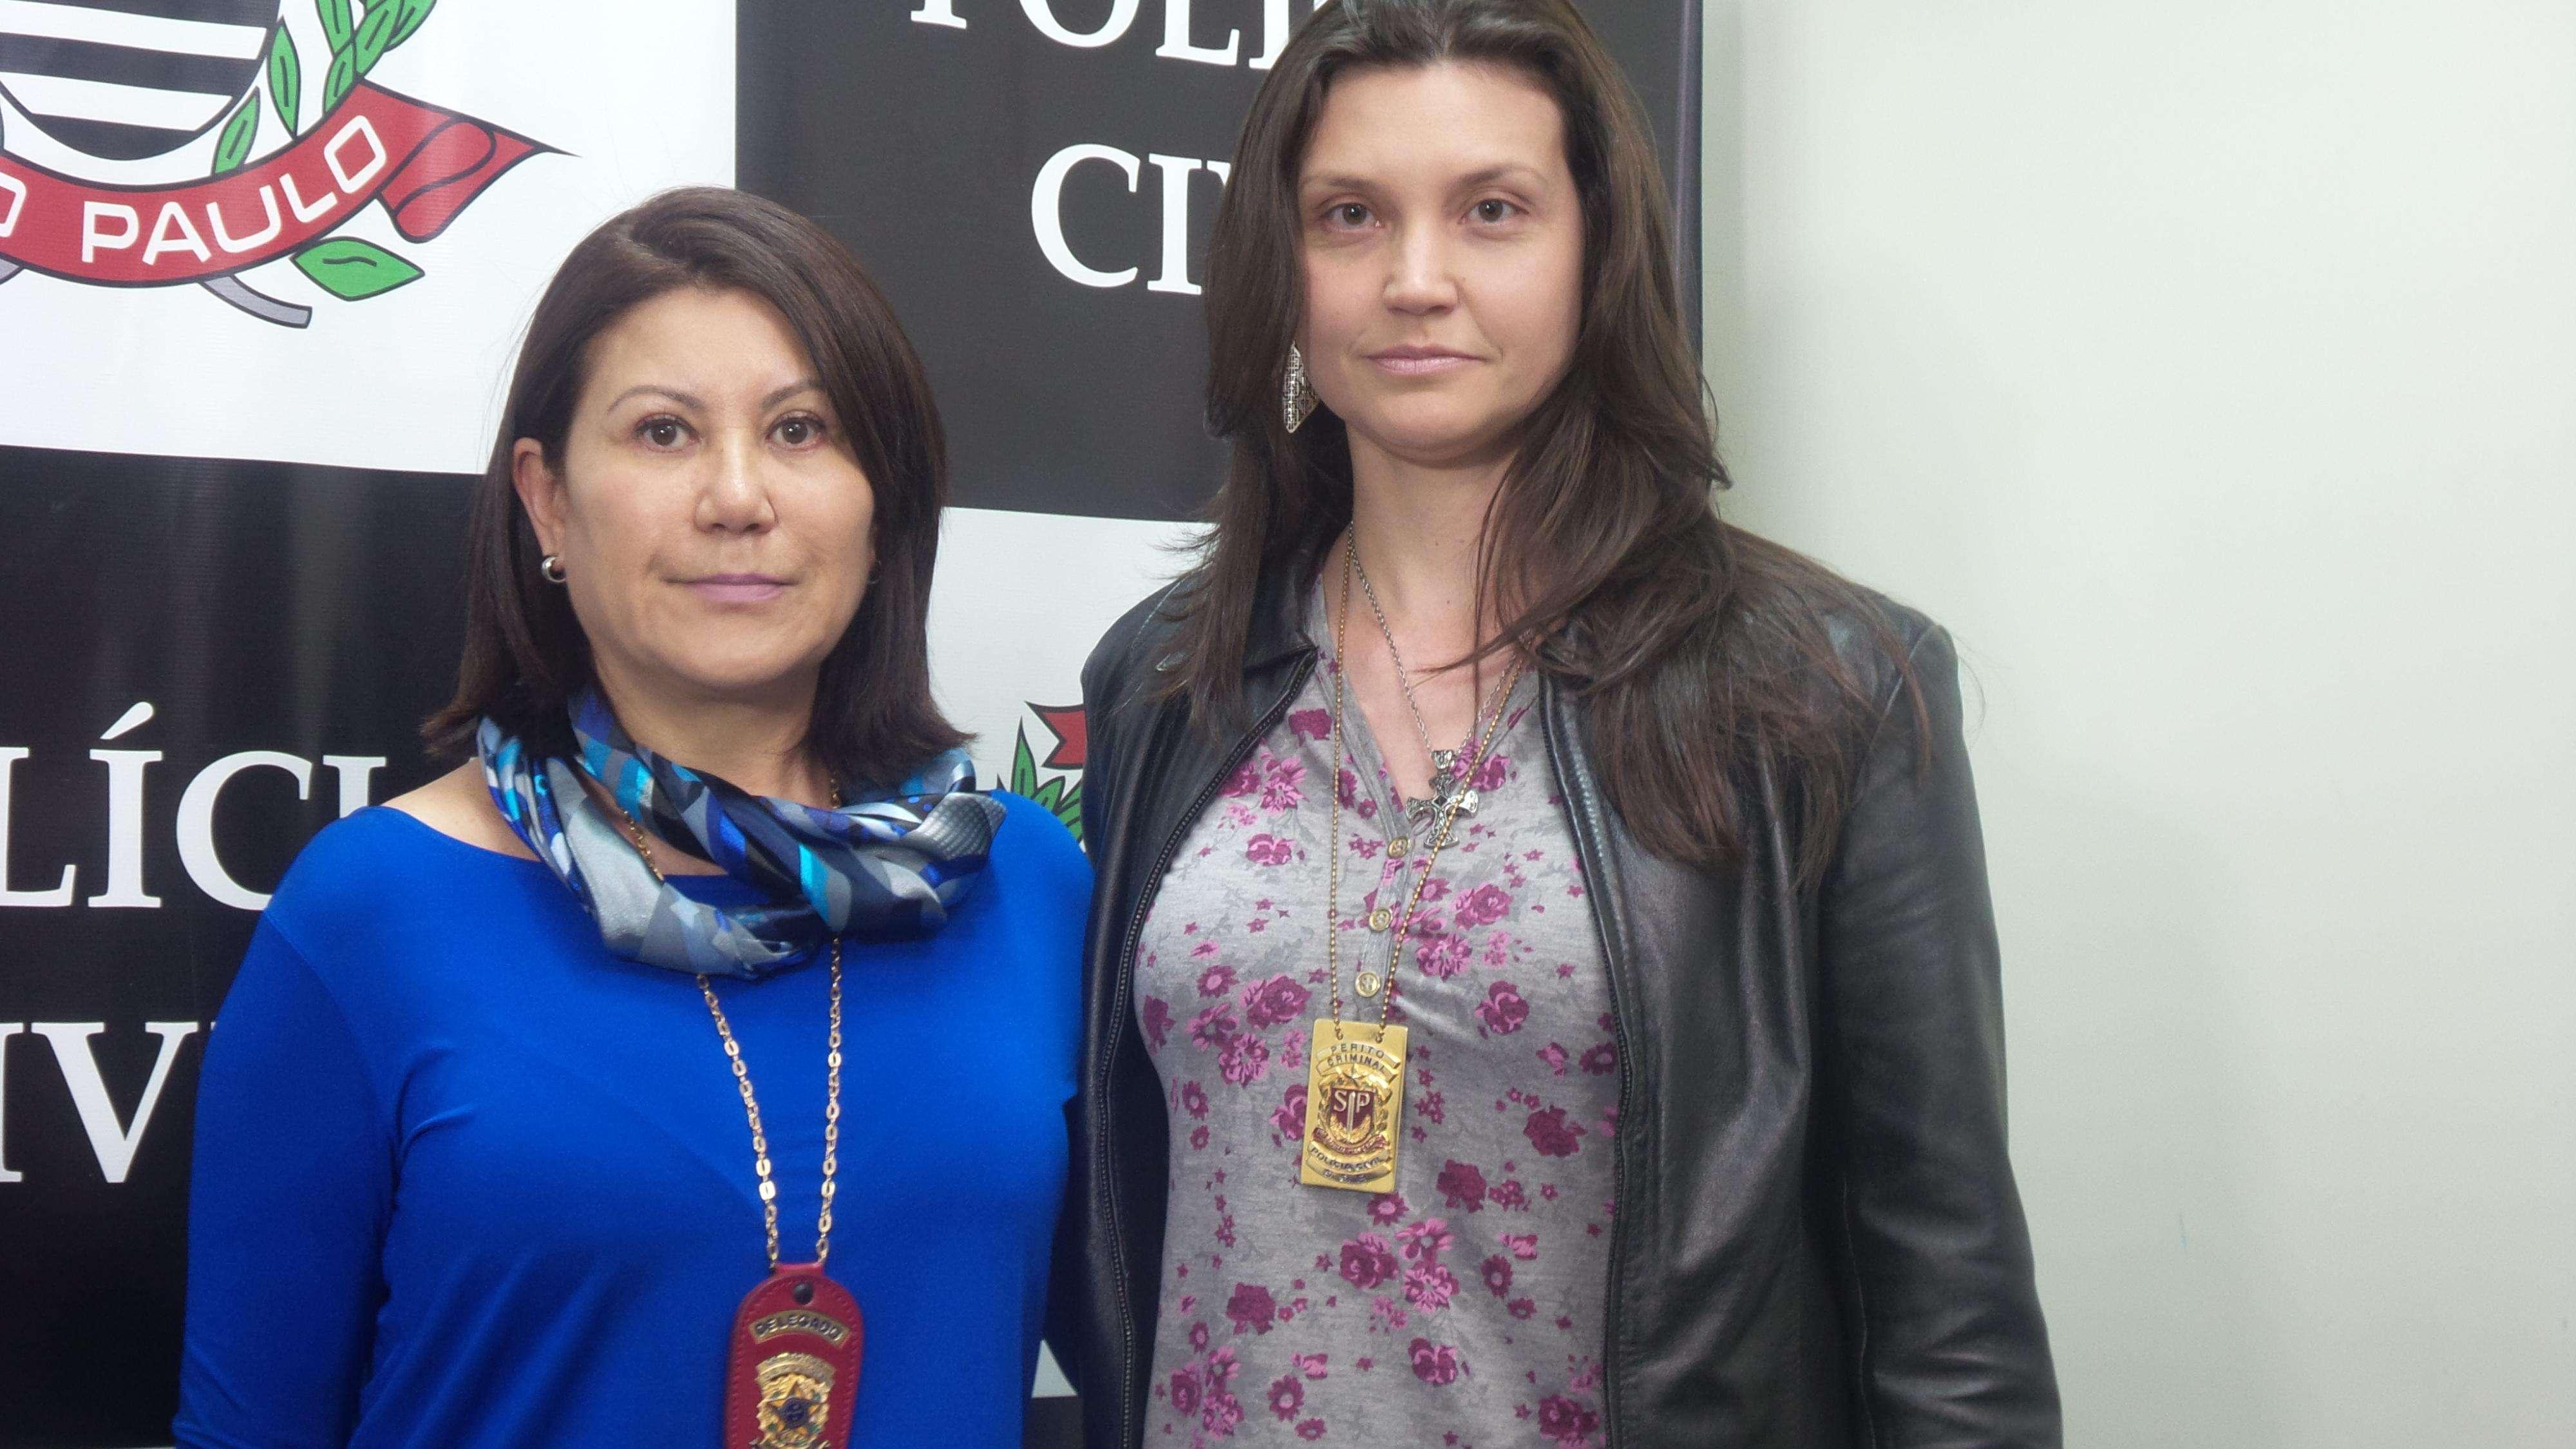 Elisabete Sato (e) e Renata Gaeta (d) falaram sobre o caso Foto: Janaina Garcia/Terra